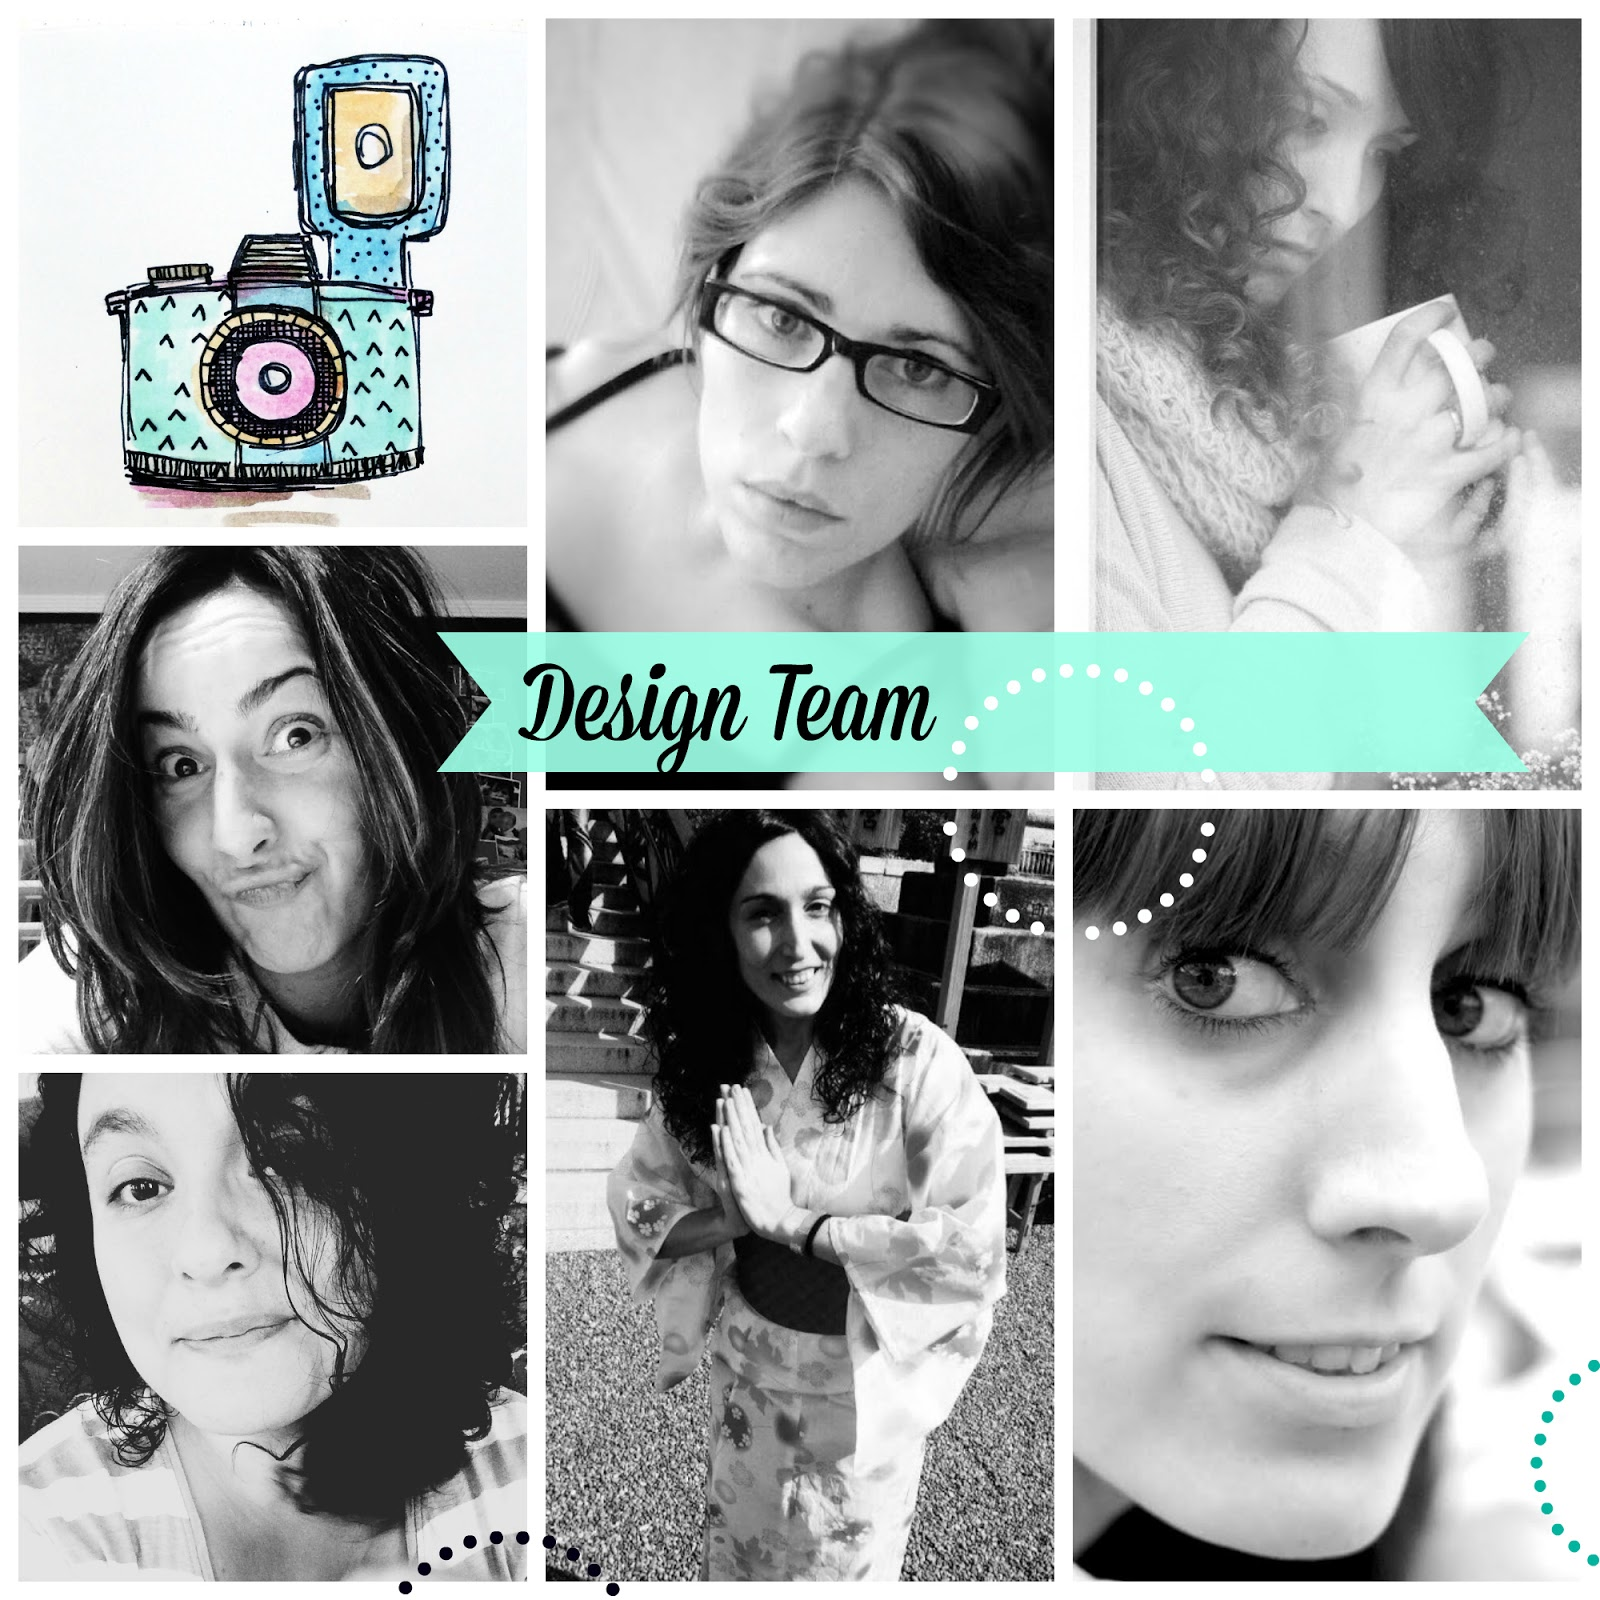 http://projectlifecafe.blogspot.com.es/